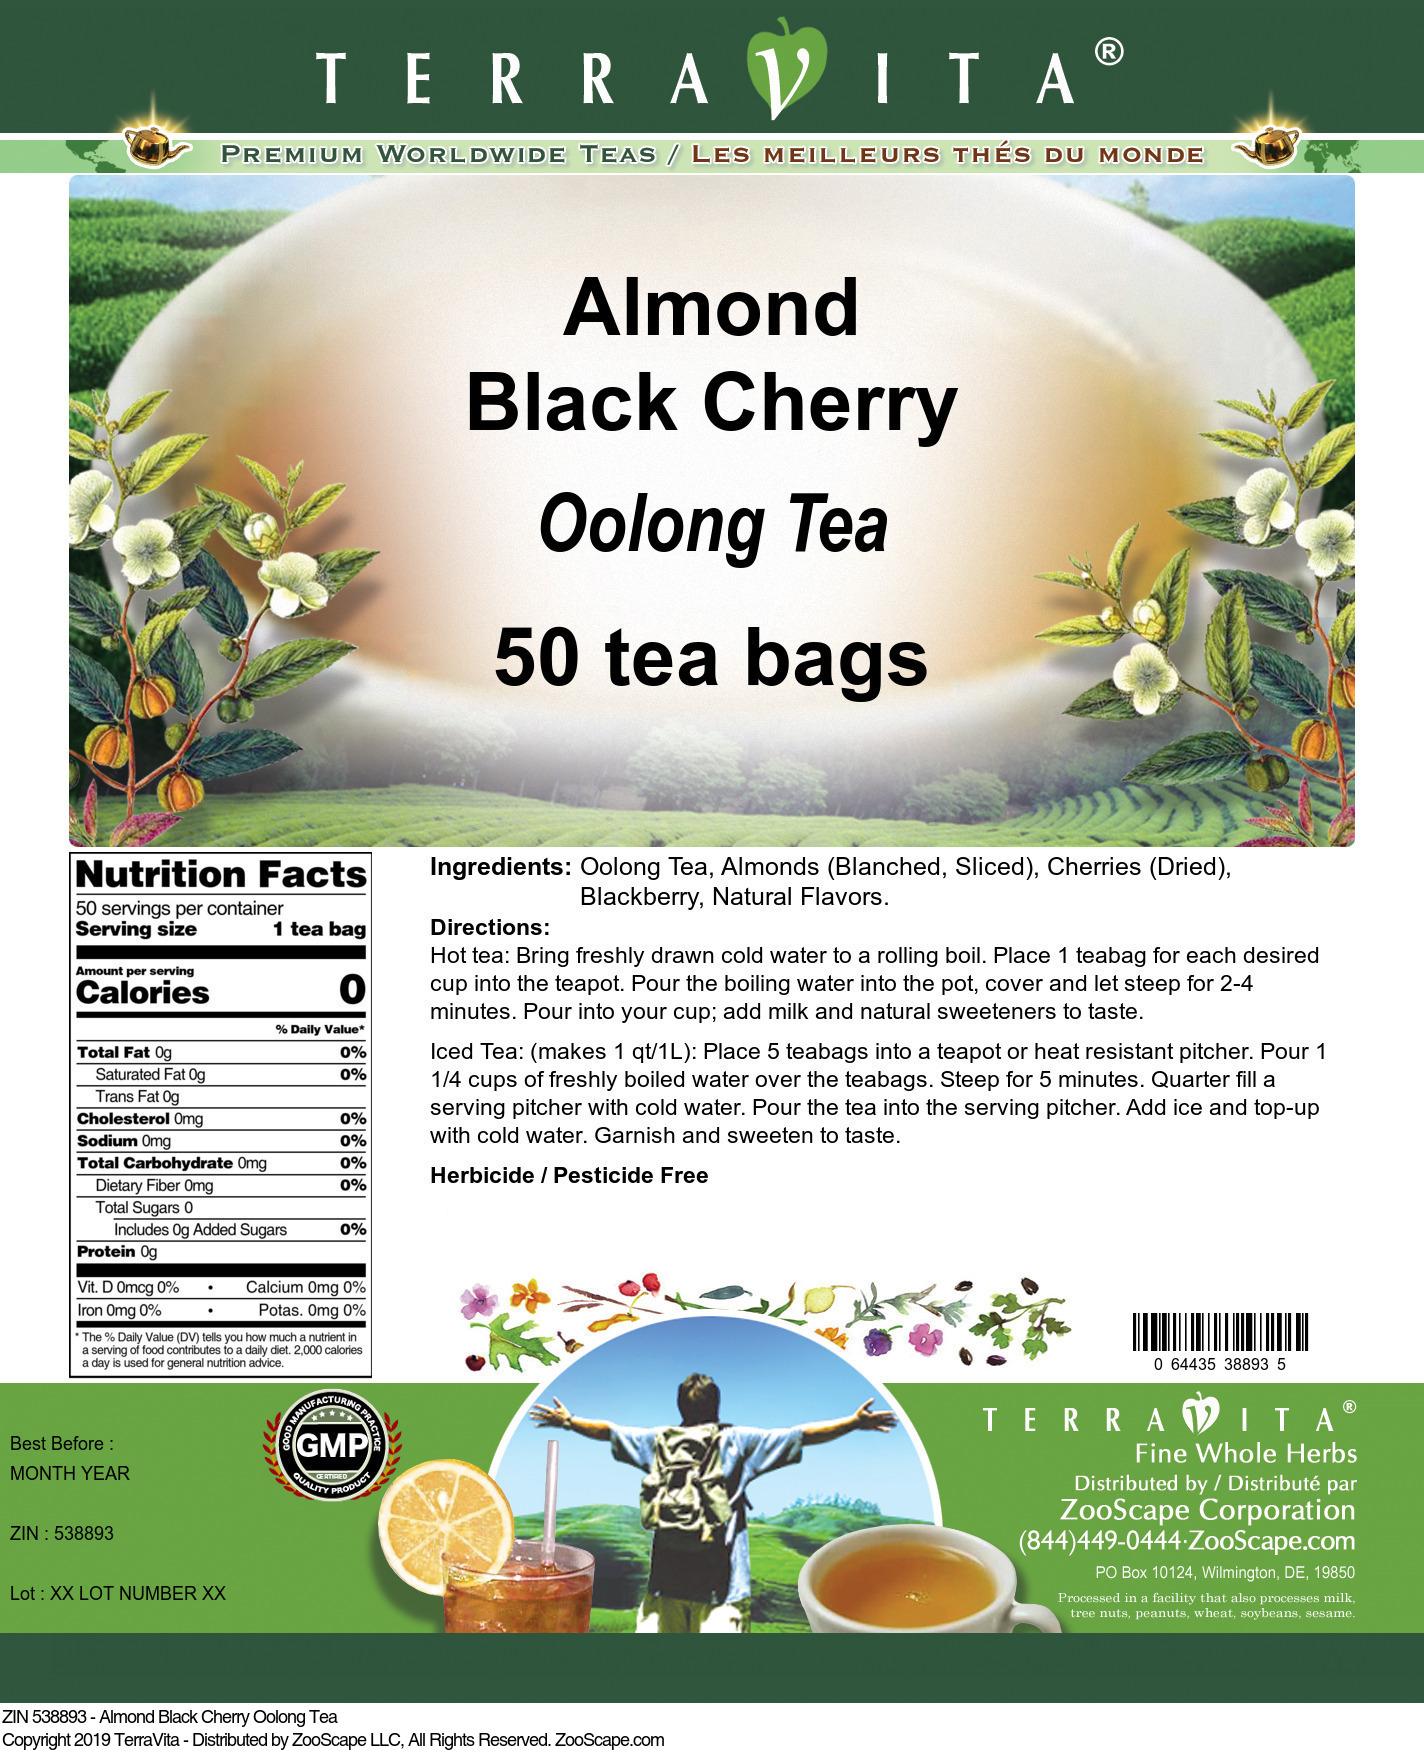 Almond Black Cherry Oolong Tea